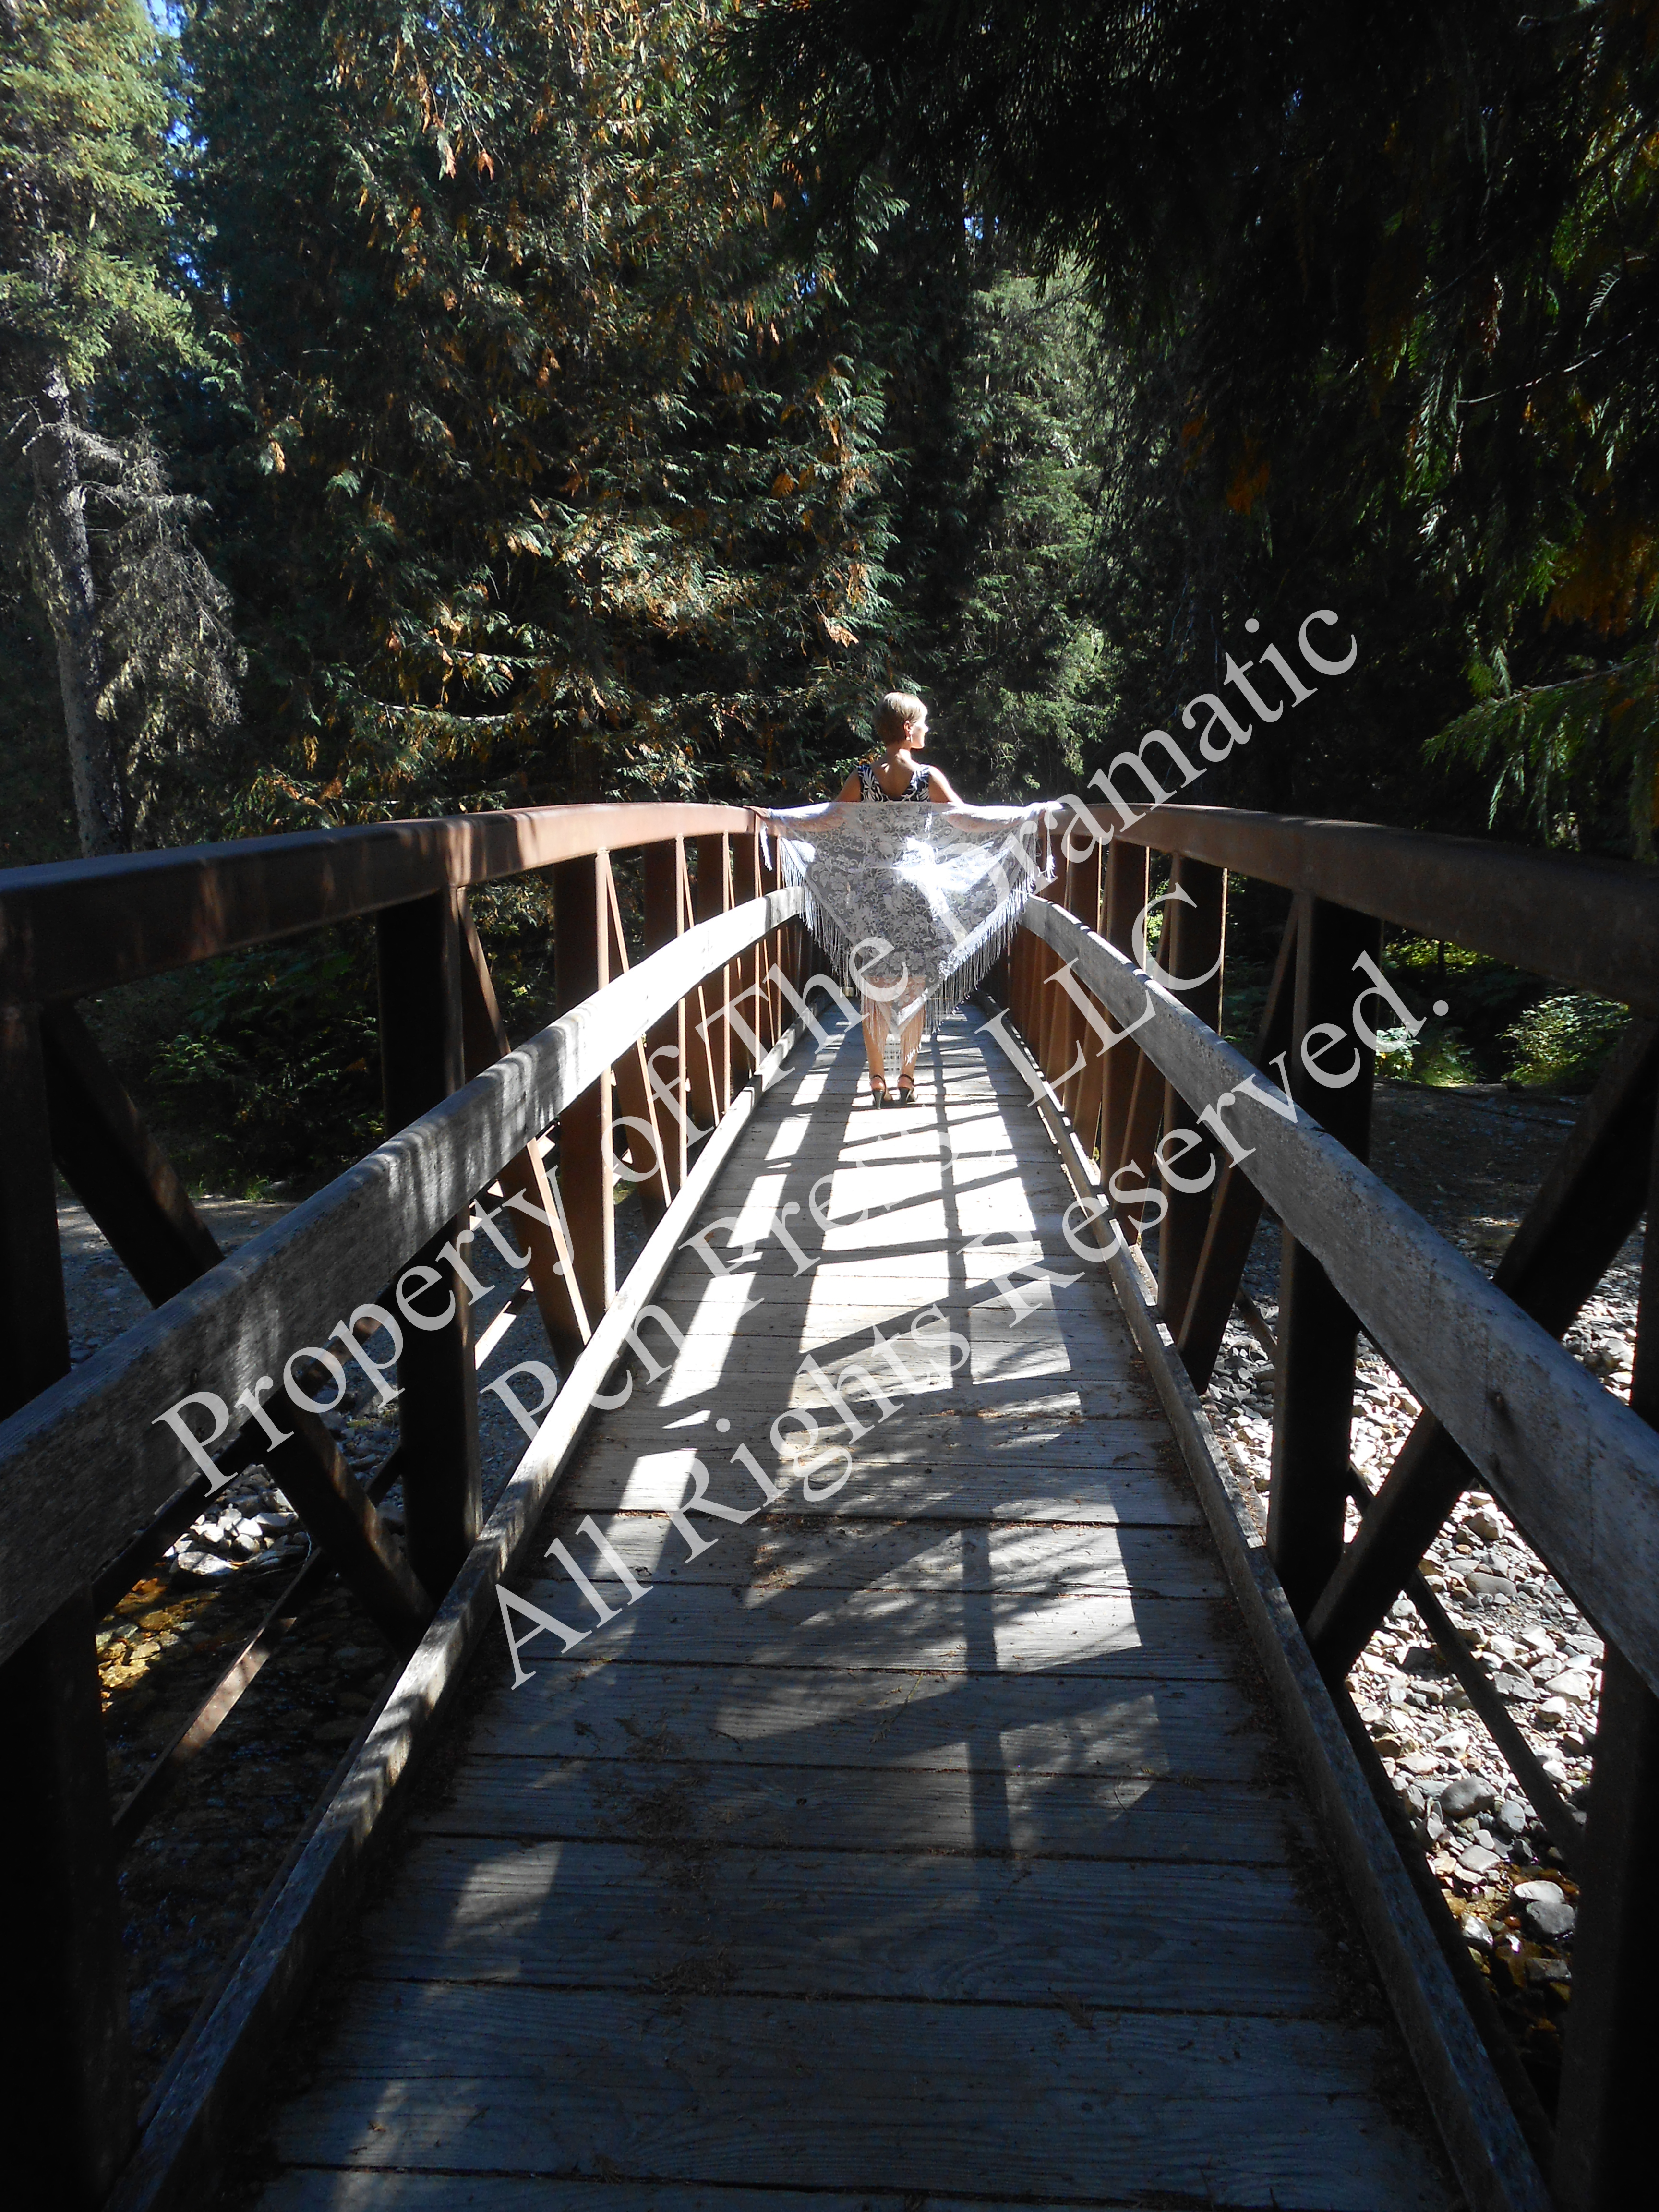 Woman in Distance on Bridge Lace